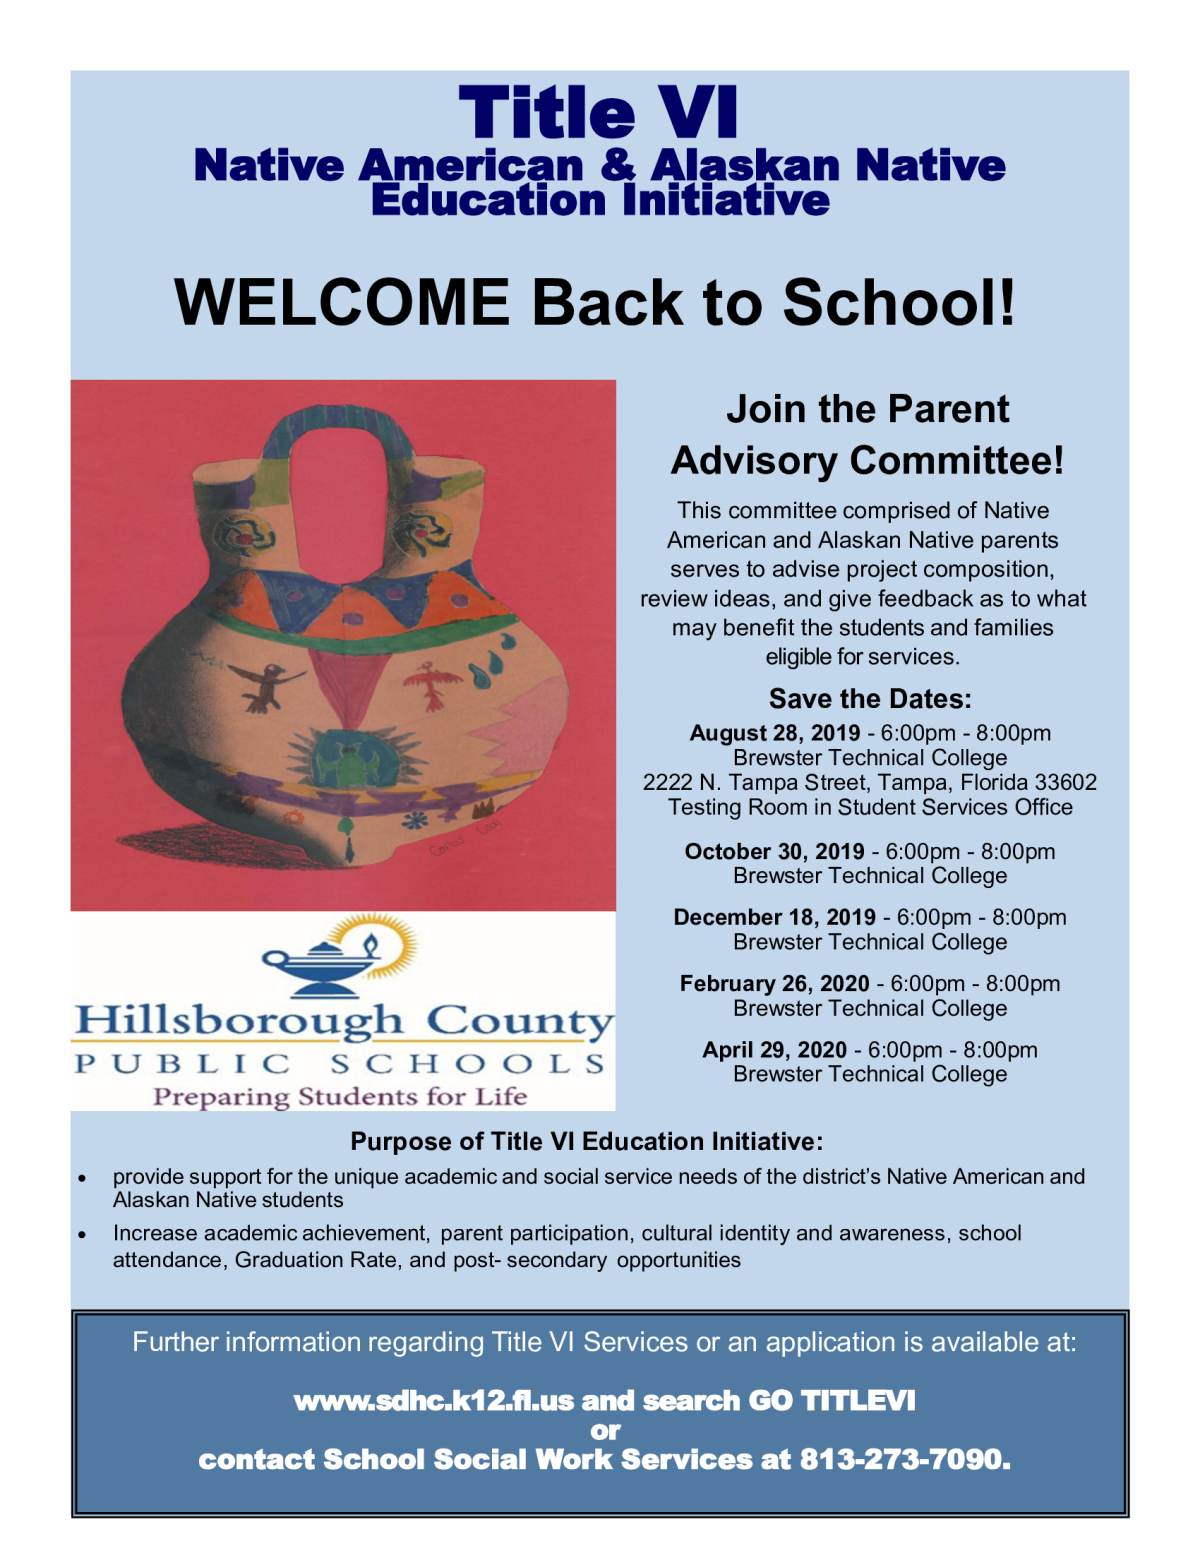 Native American & Alaskan Native Parent Advisory Council